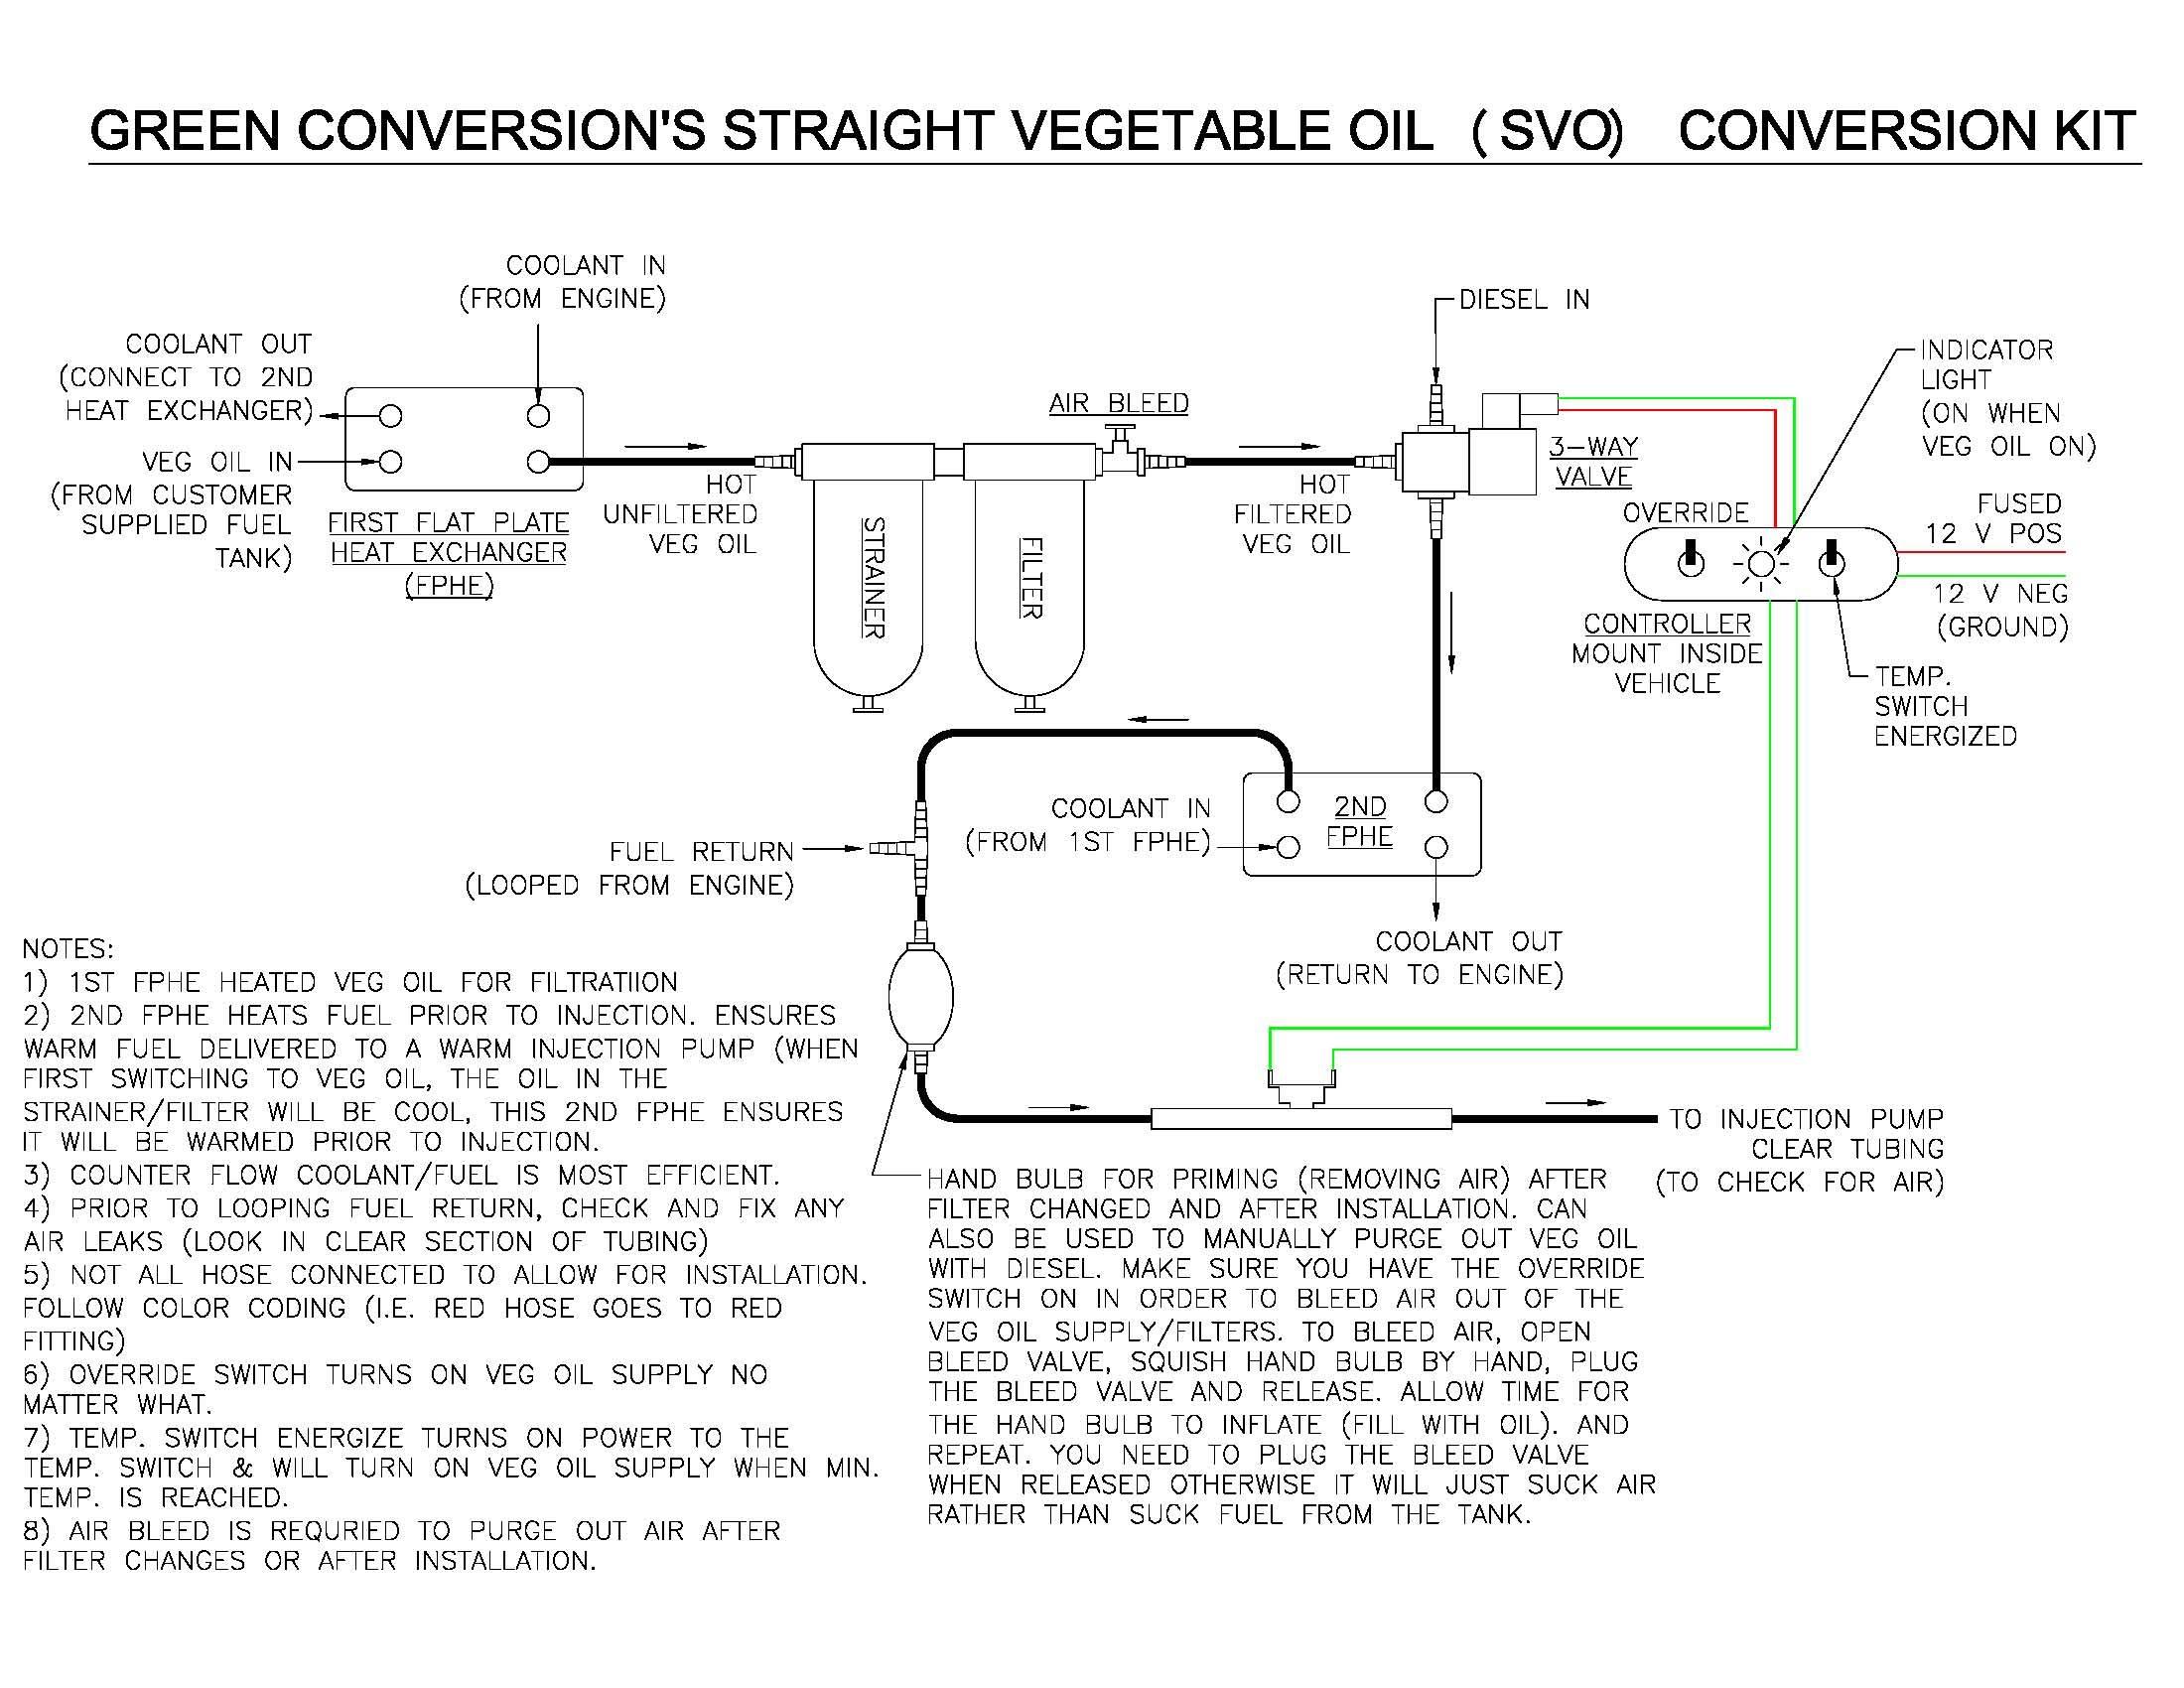 vintage unity spotlight wiring diagram vs commodore spotlight wiring diagram - somurich.com